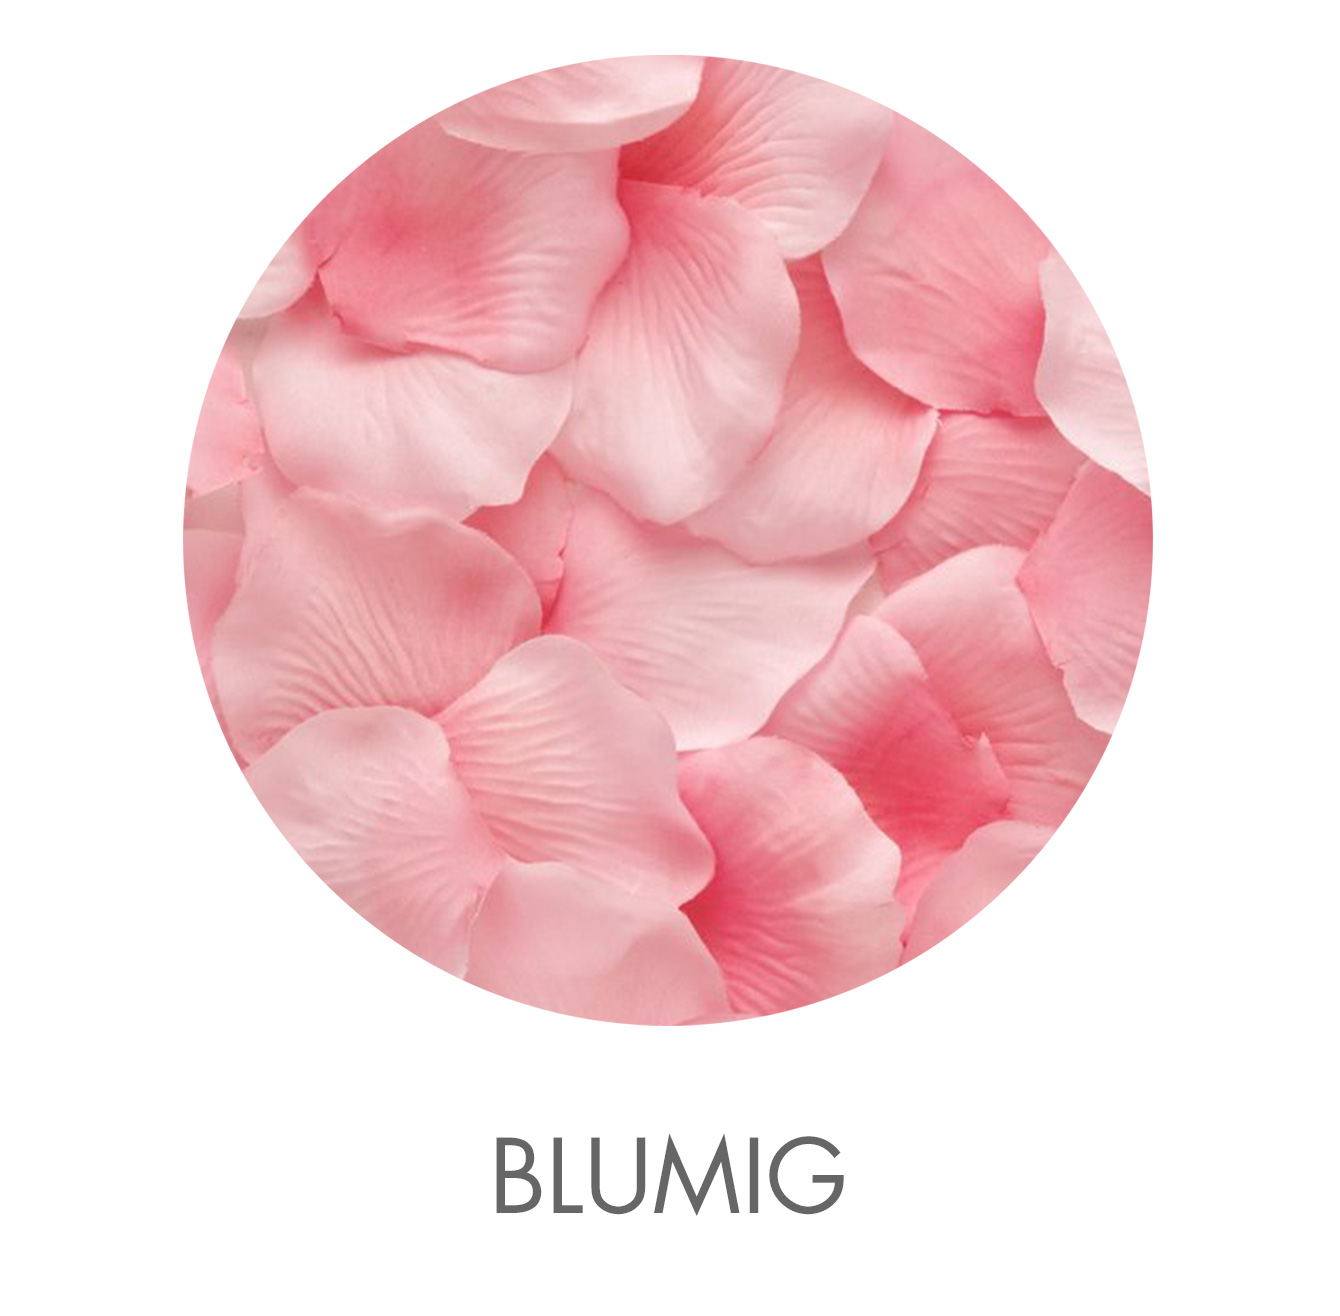 Blumig